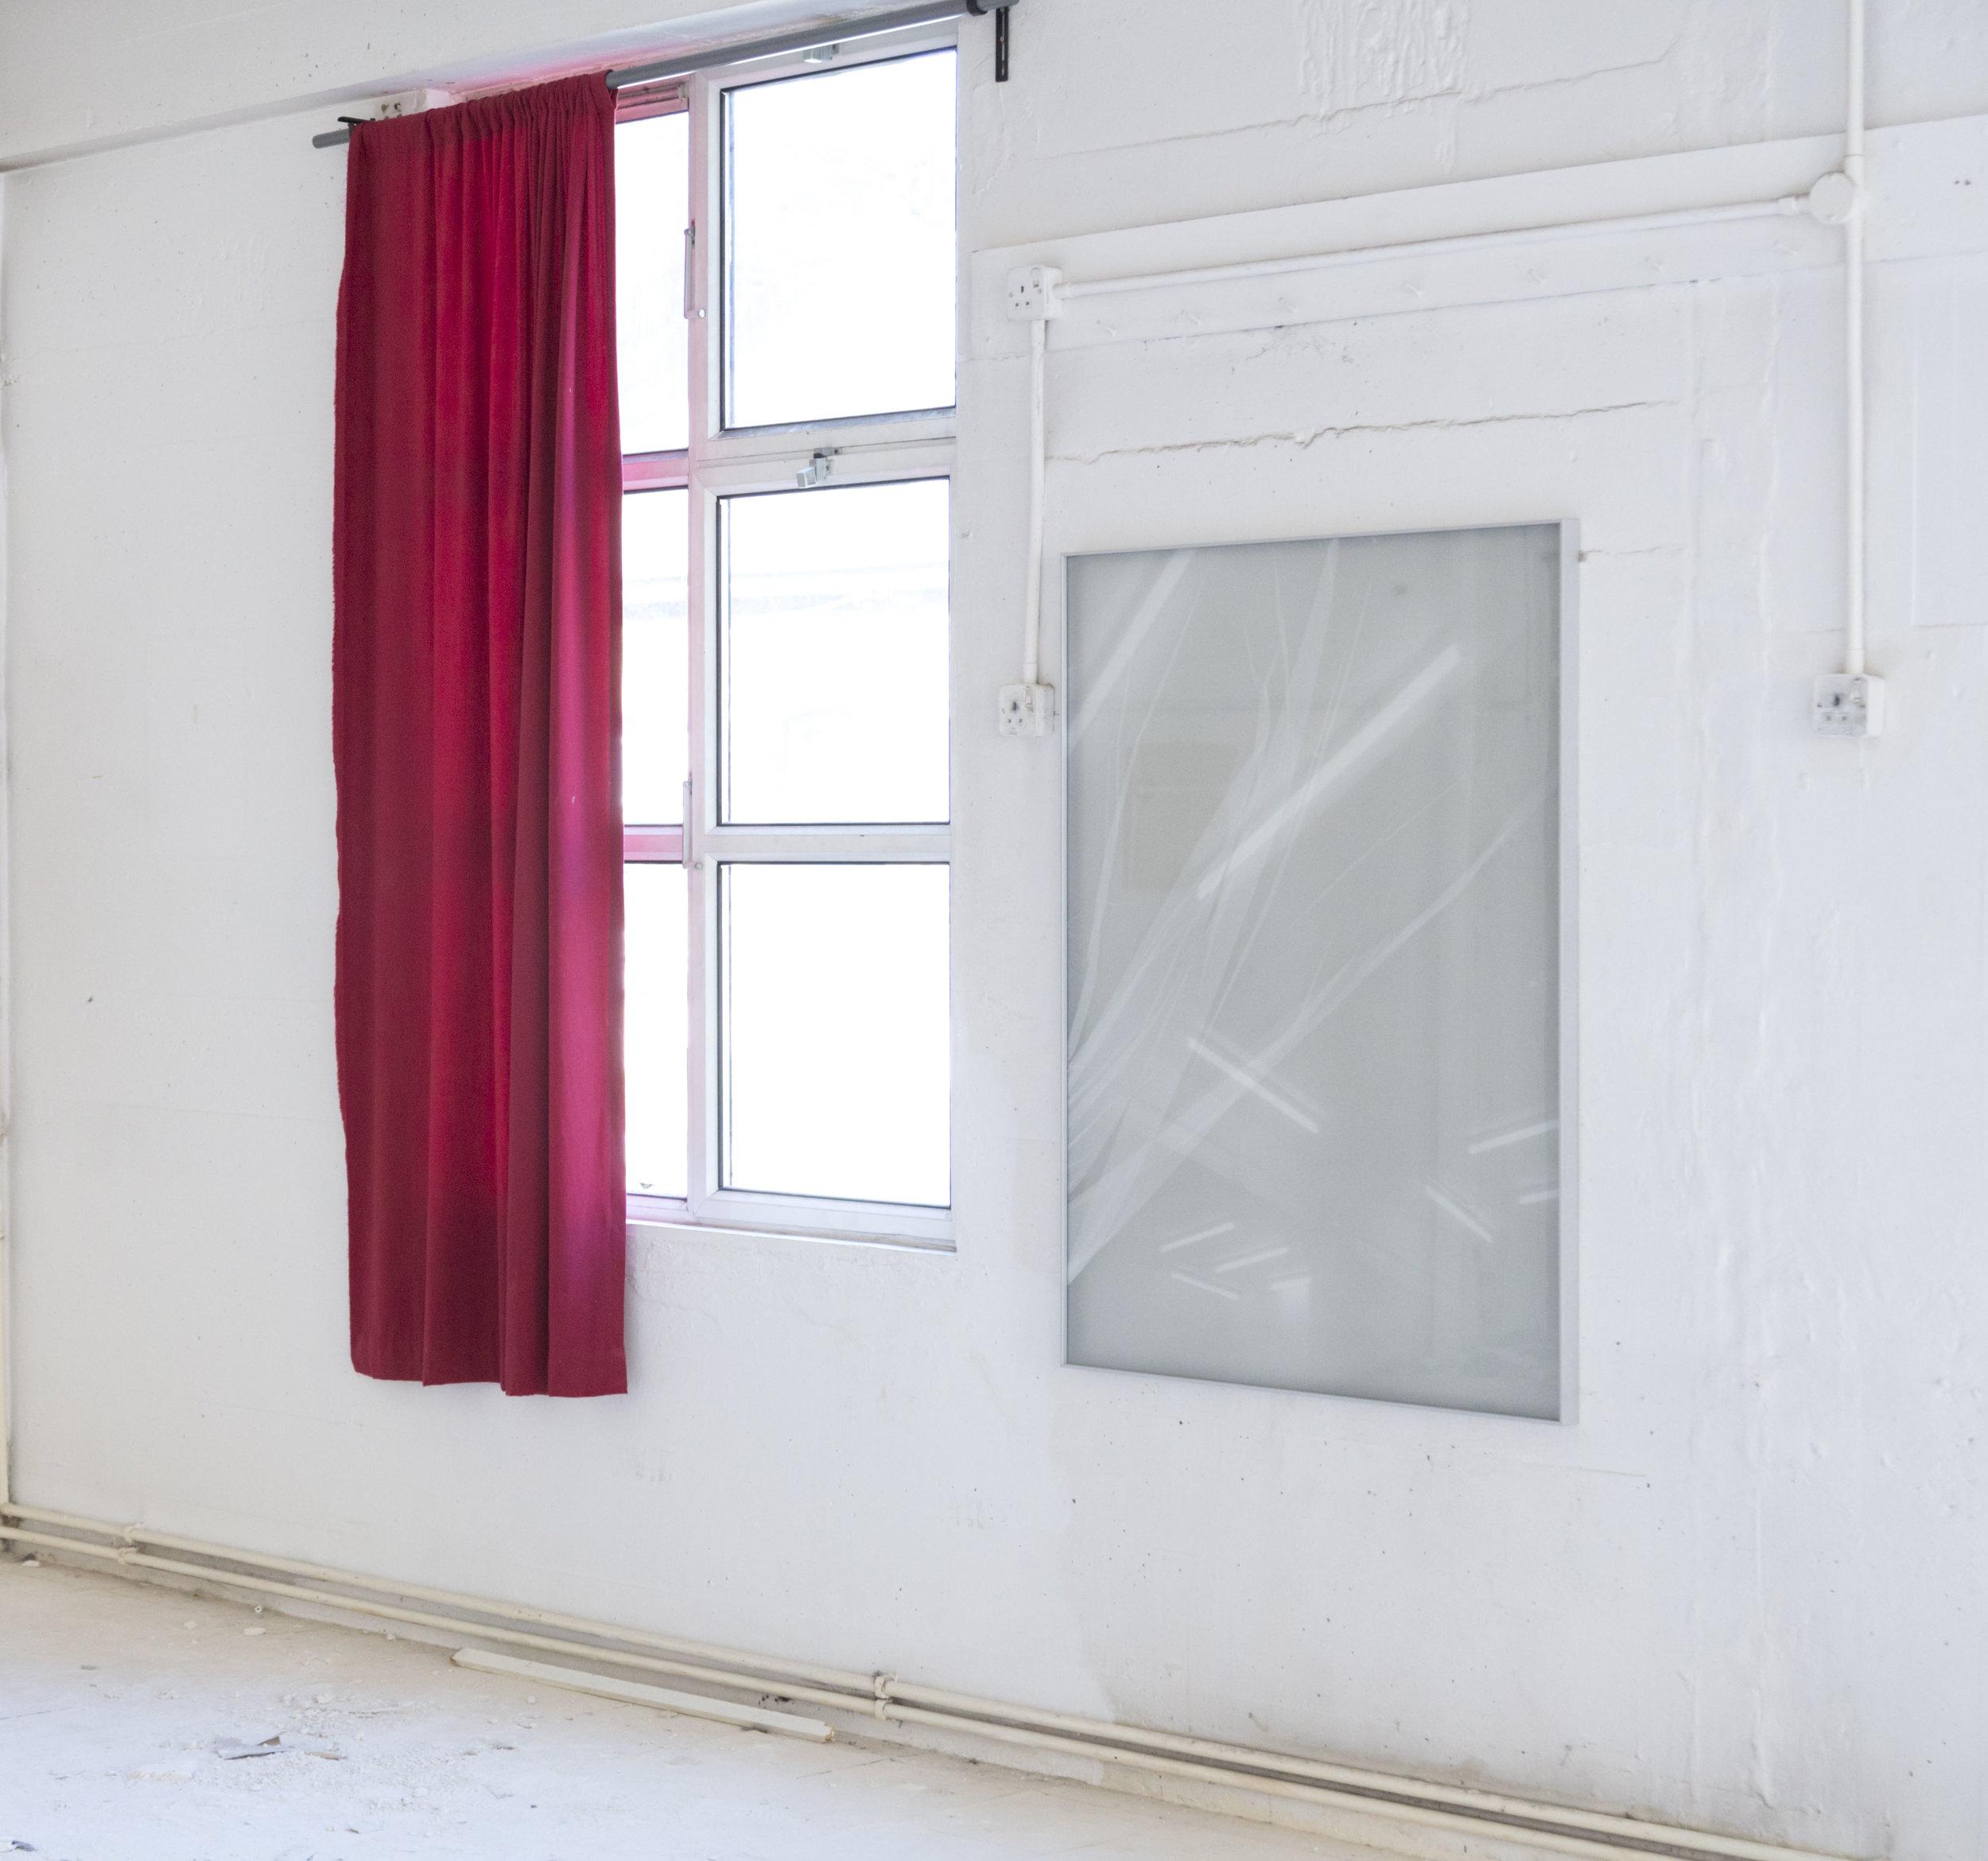 Enterprise House, London, 2017  UV print on glass